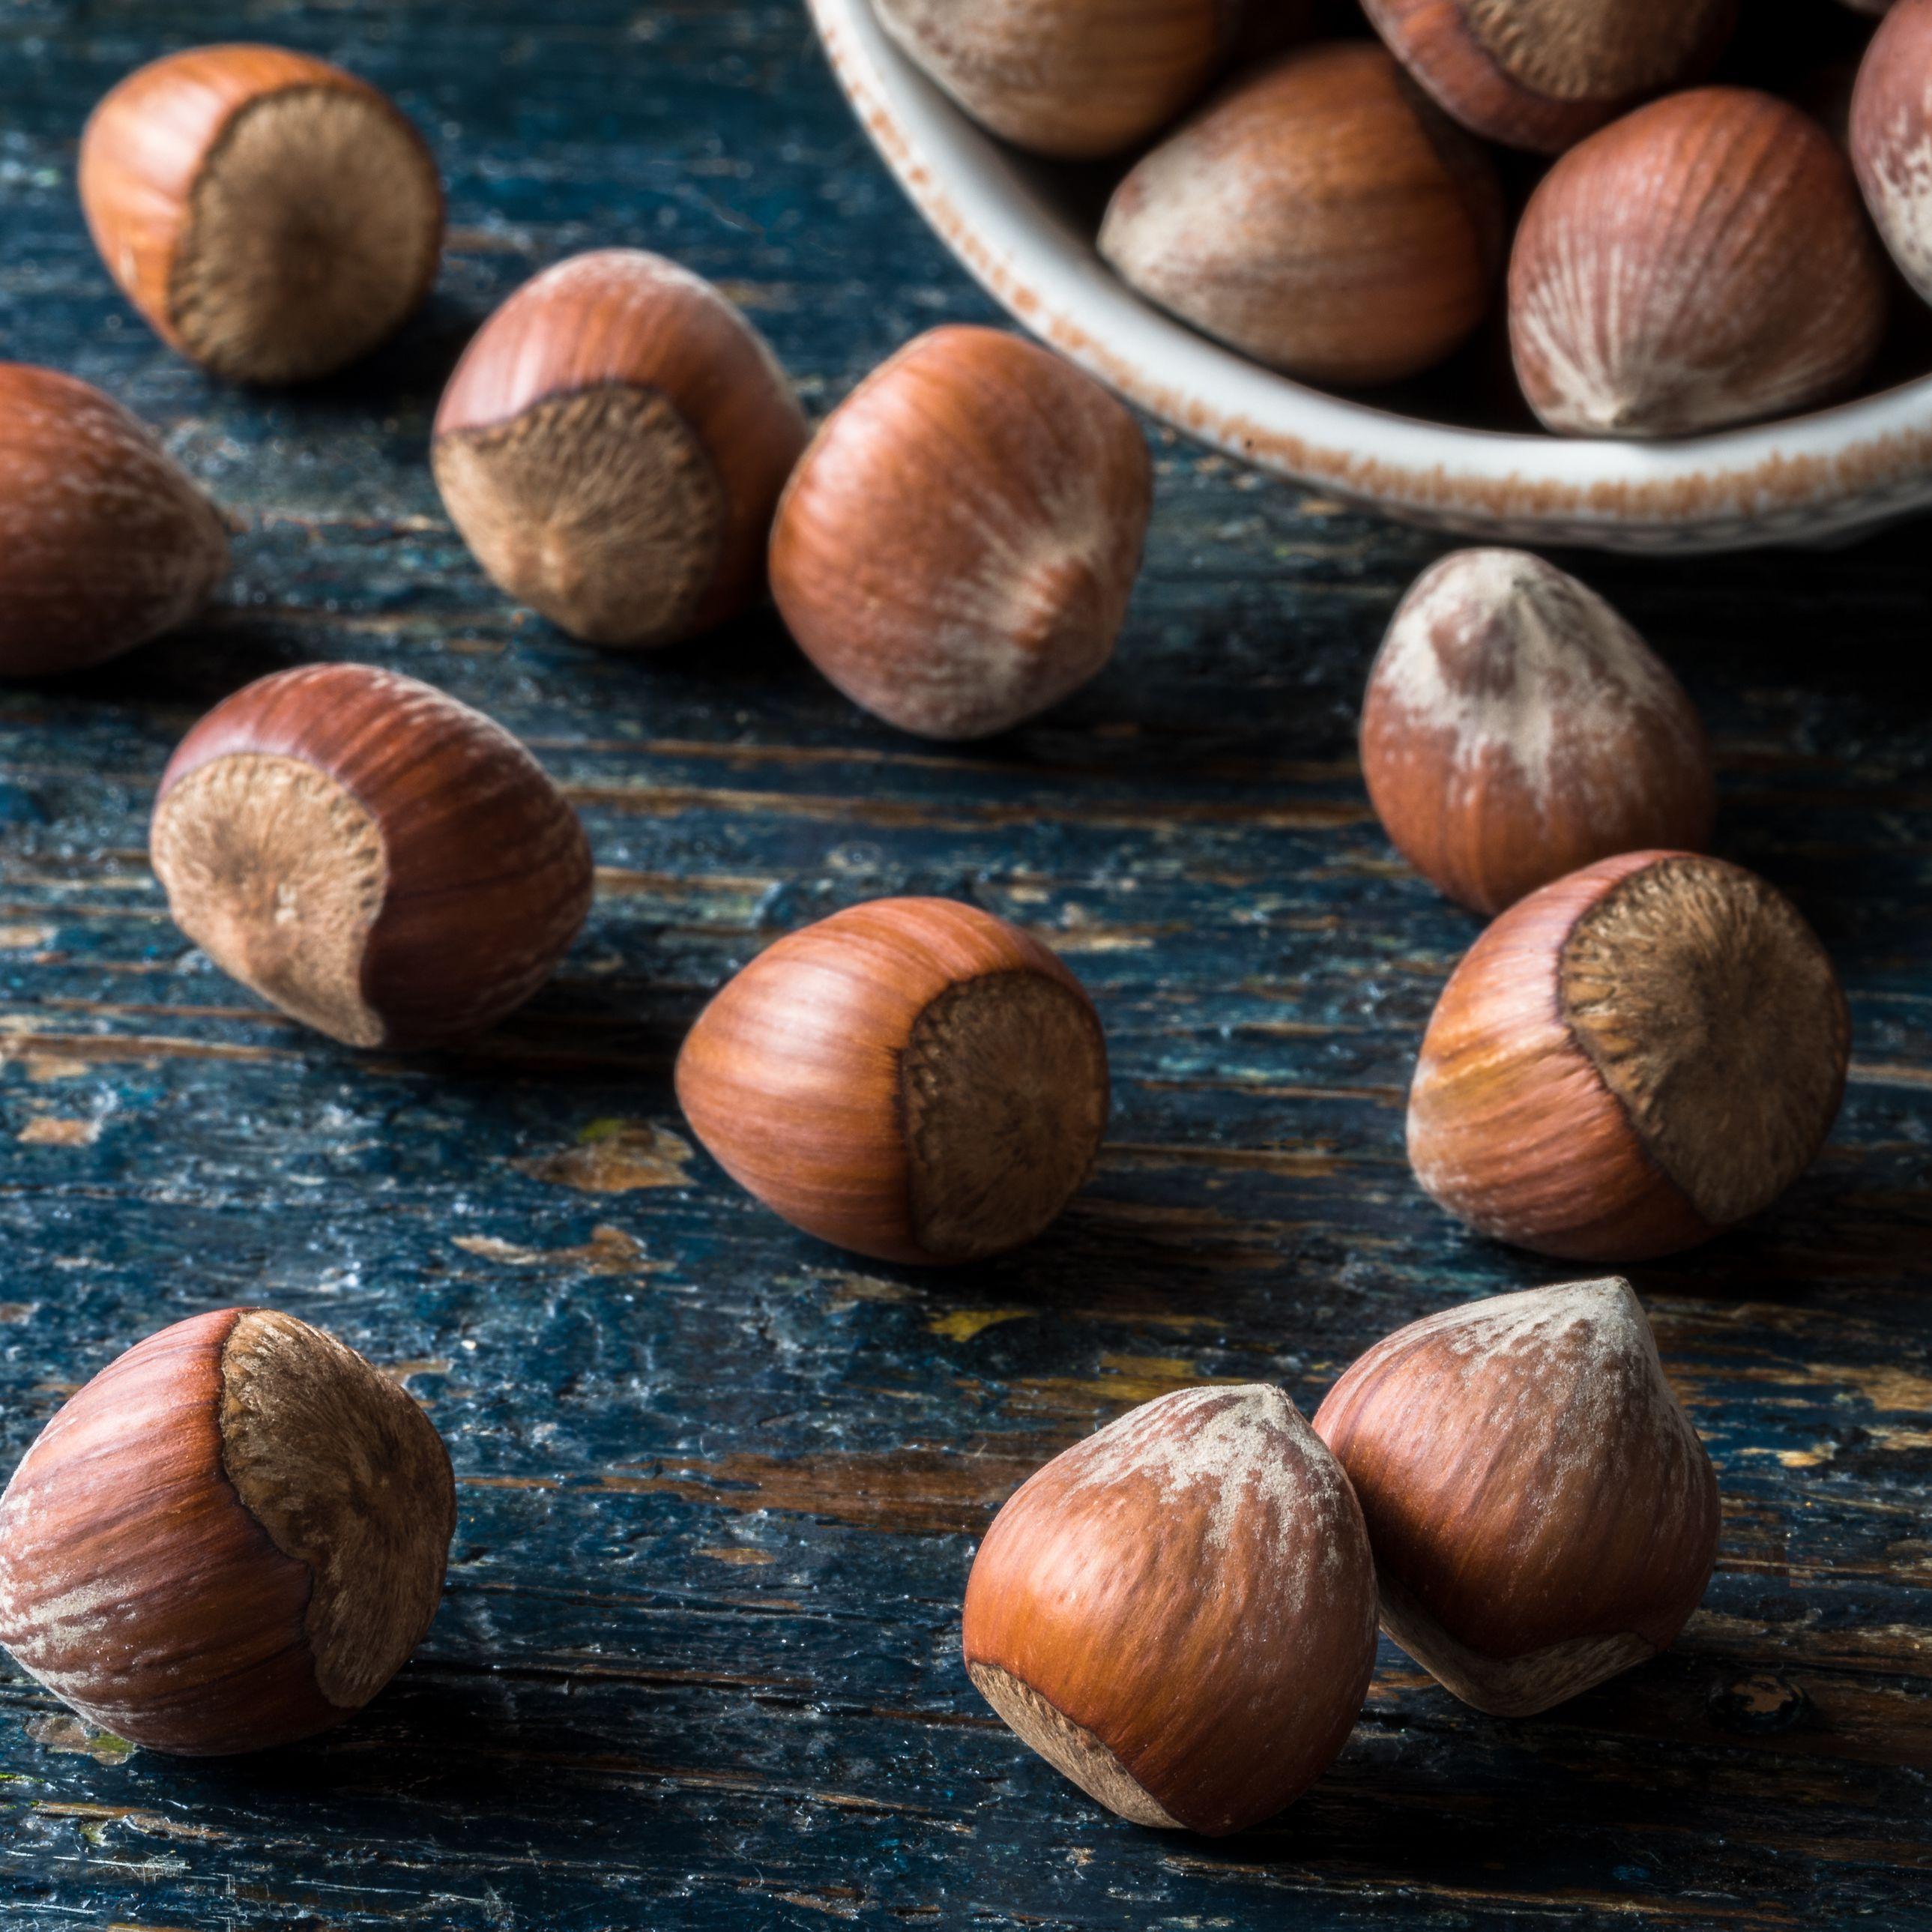 Learn About Hazelnuts (Haselnuesse) in German Cooking